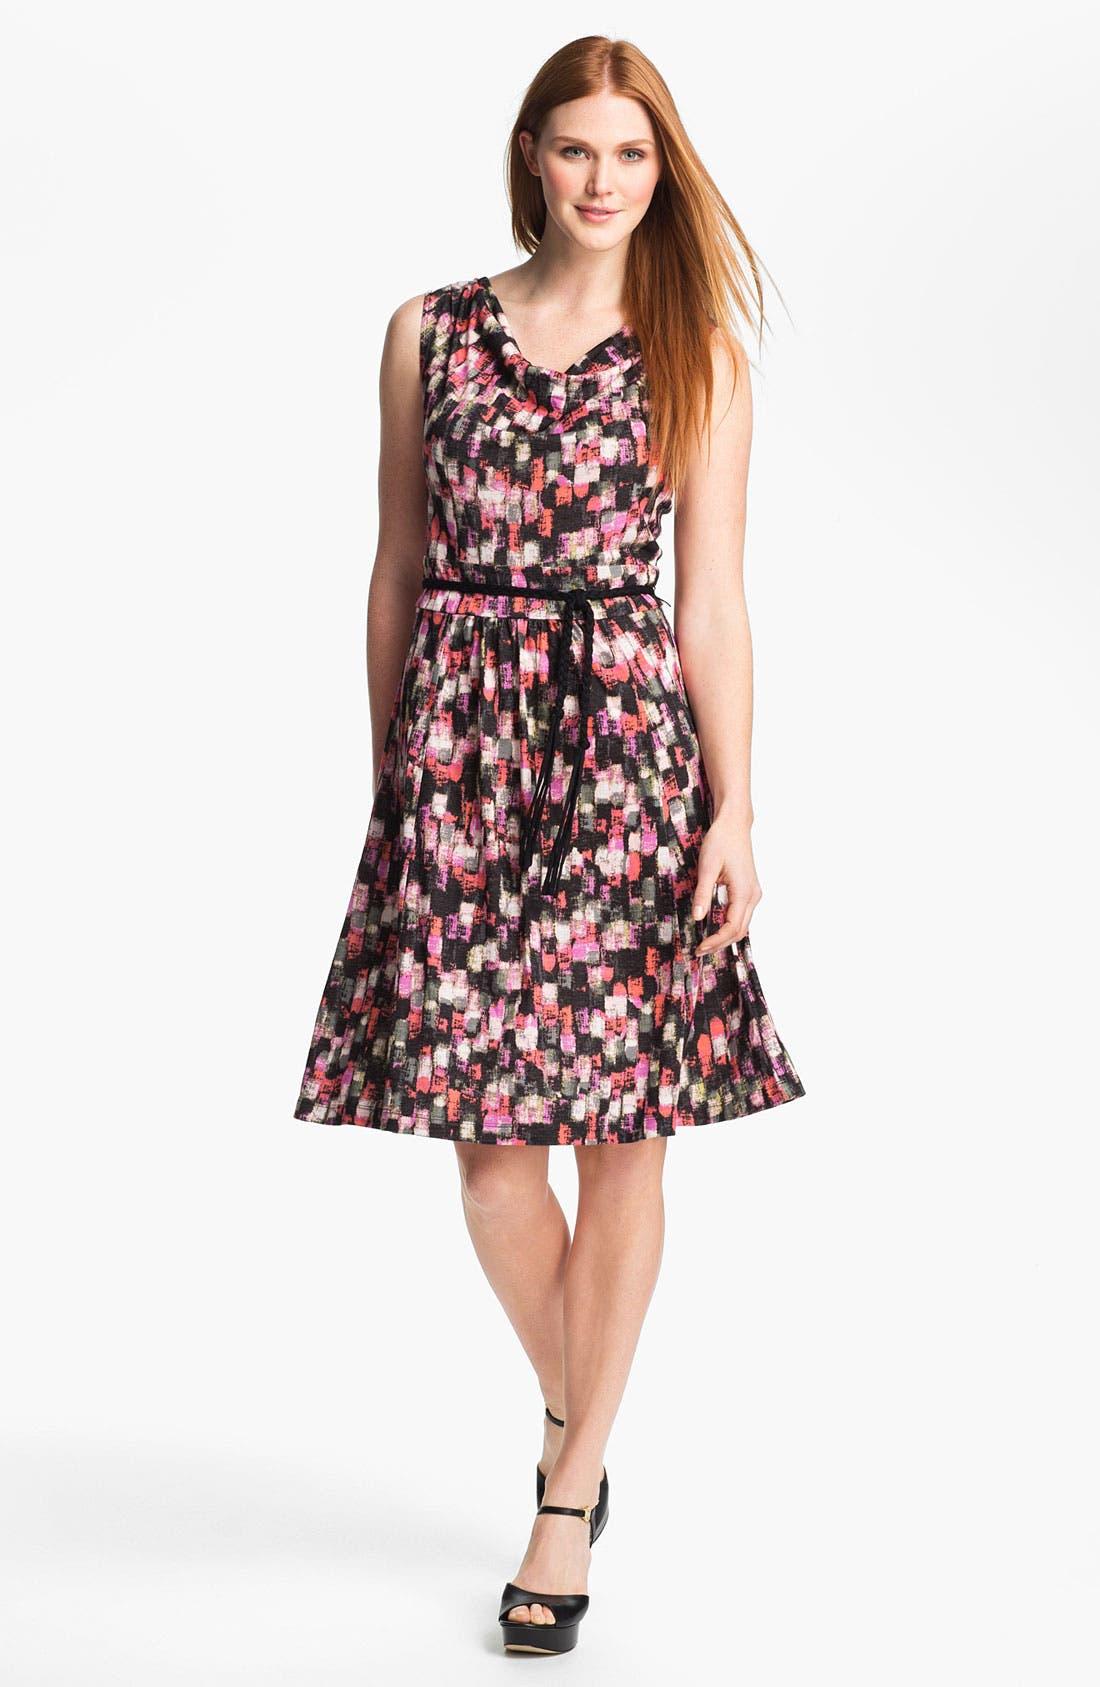 Main Image - Nic + Zoe 'Spring Rain' Dress